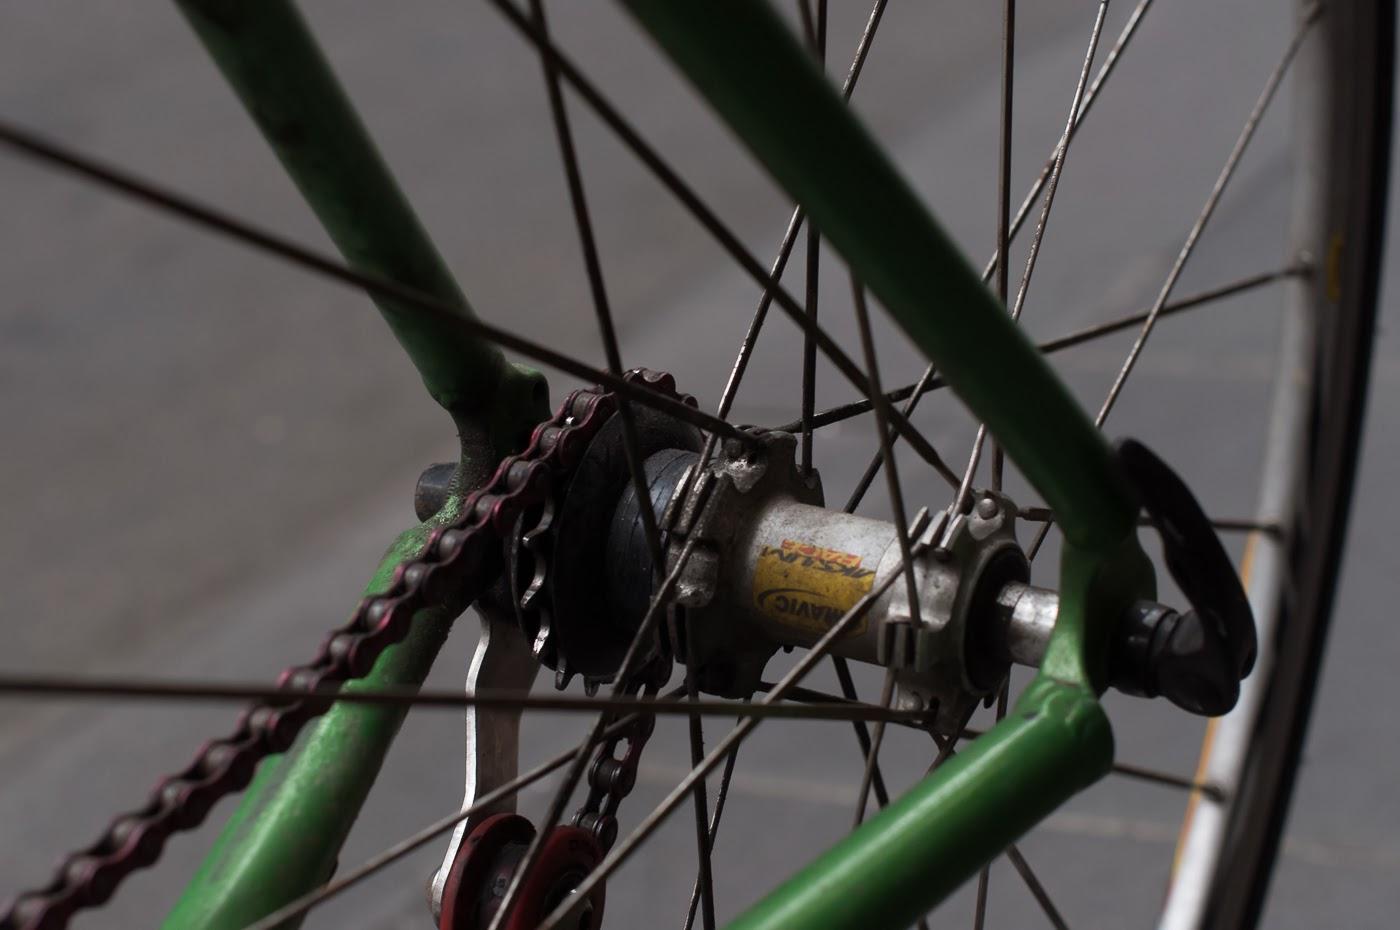 single speed, bike, bicycle, tim macauley, the biketorialist, melbourne, conversion, chain, tensioner road bik, mavic, rear hub, cassette spacers, spacers